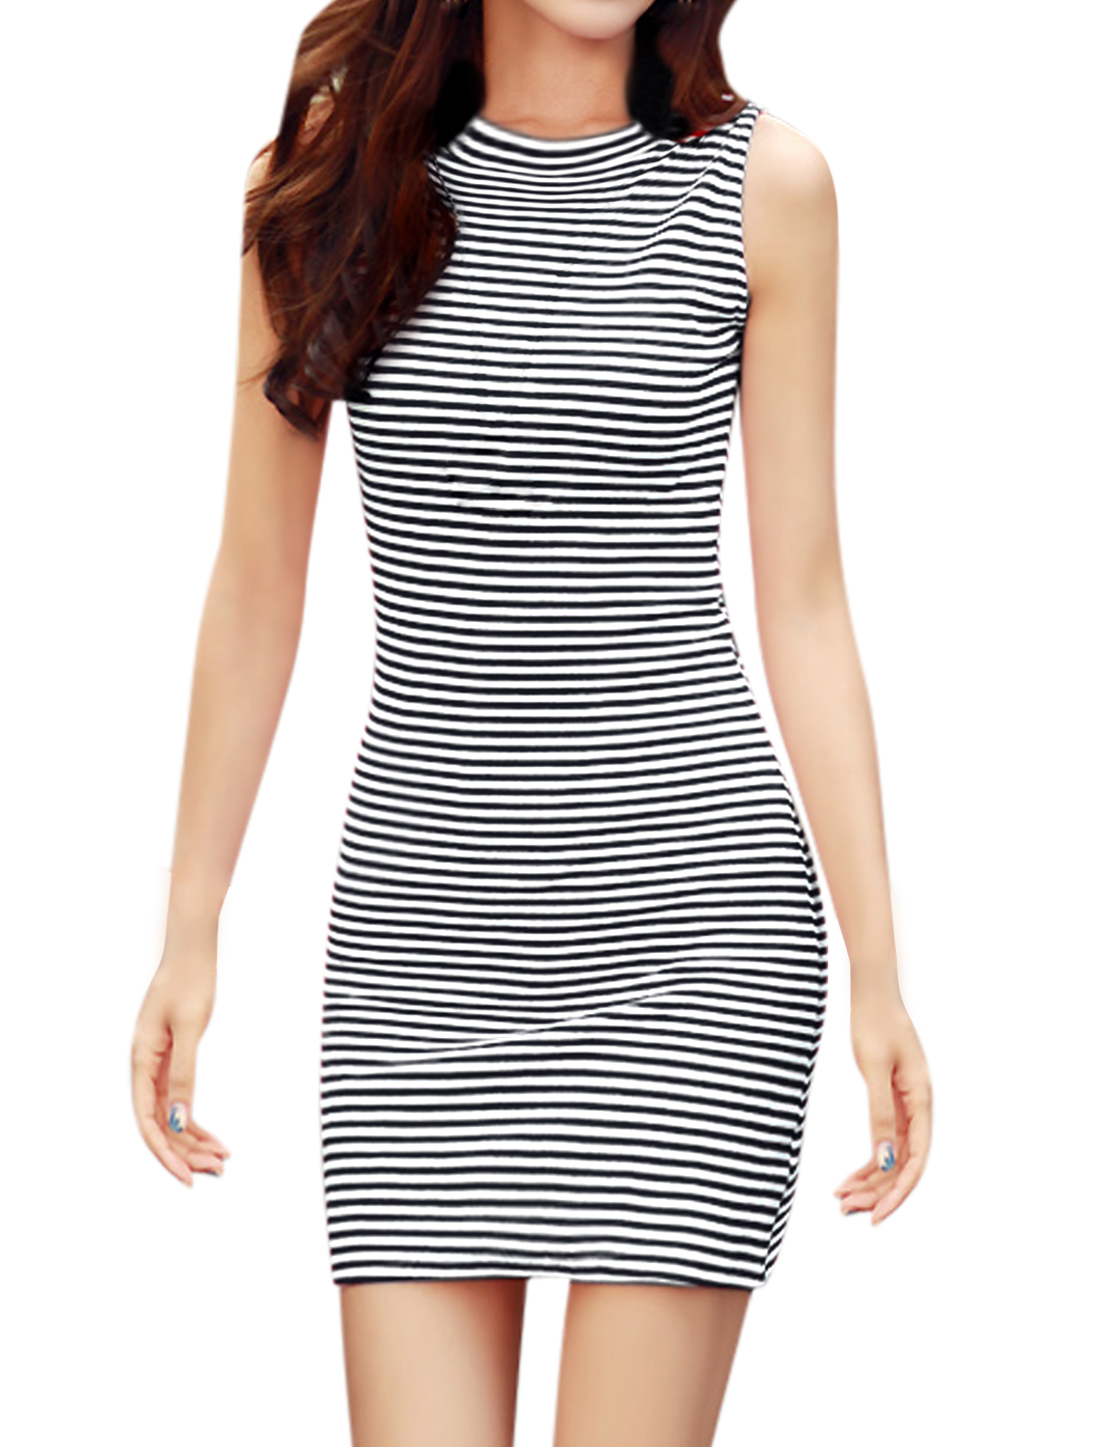 Women Horizontal Stripes Sleeveless Unlined Bodycon Dress Navy Blue White M